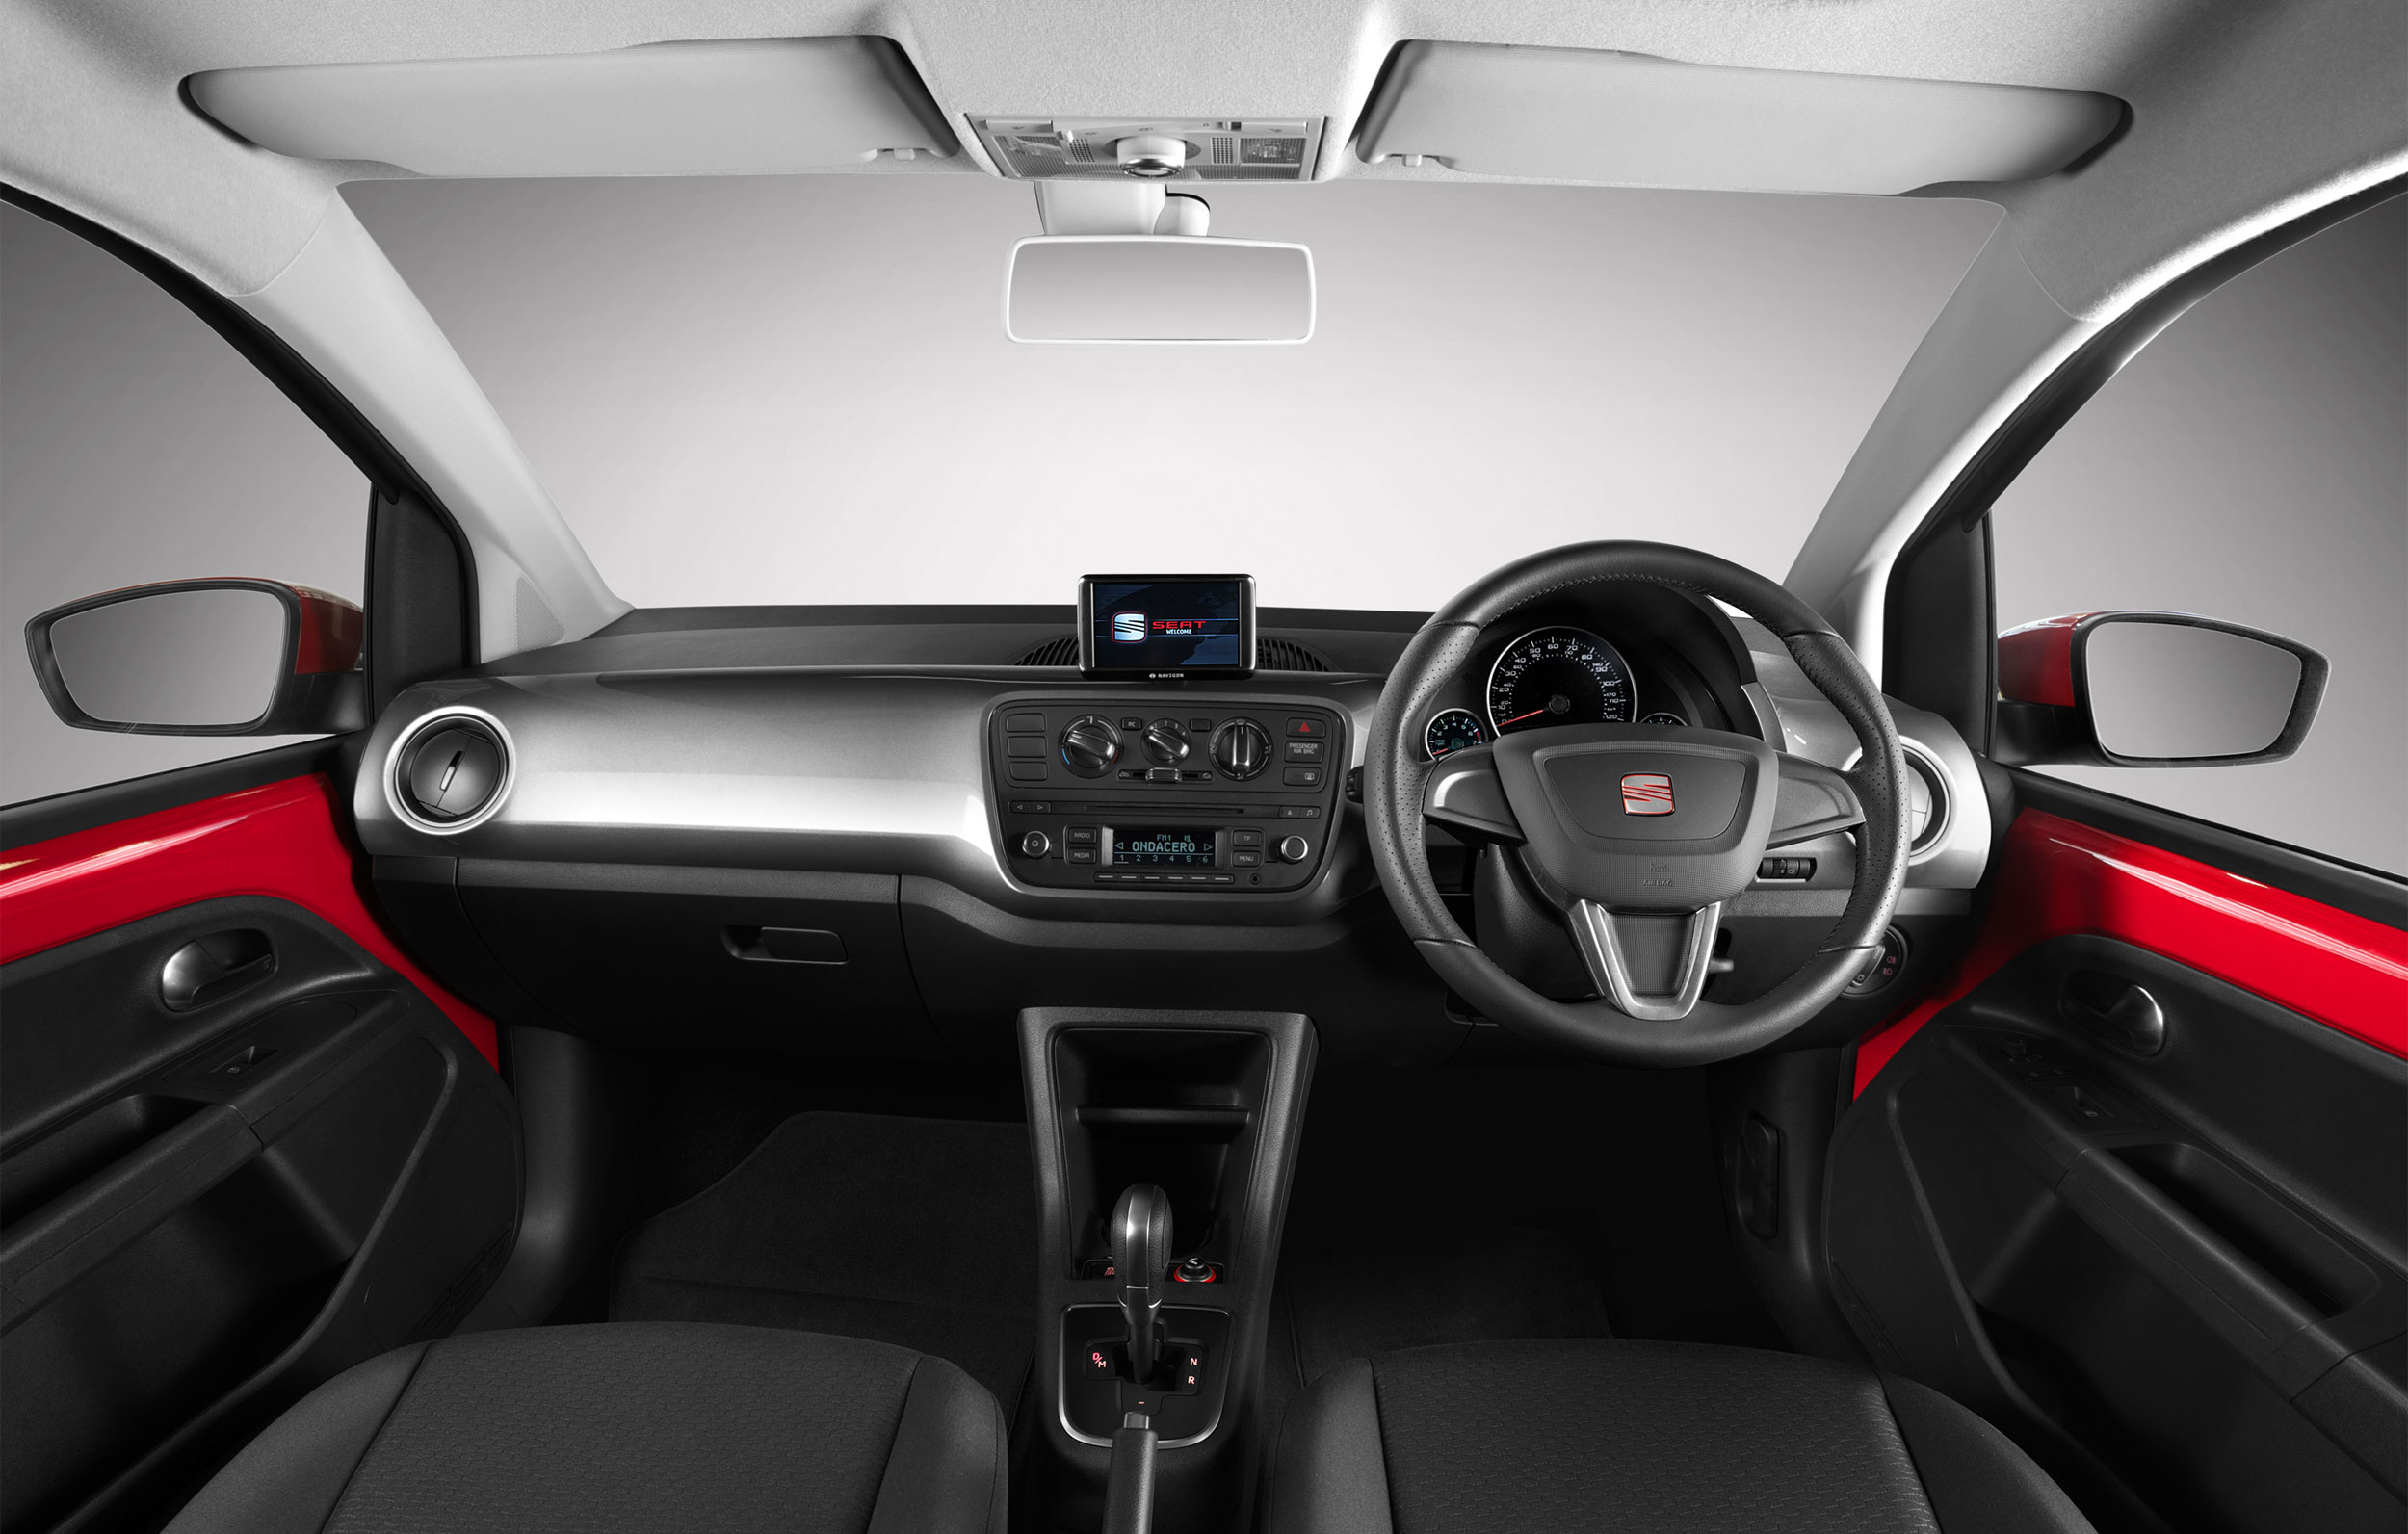 seat cordoba 2013 interior autos post. Black Bedroom Furniture Sets. Home Design Ideas